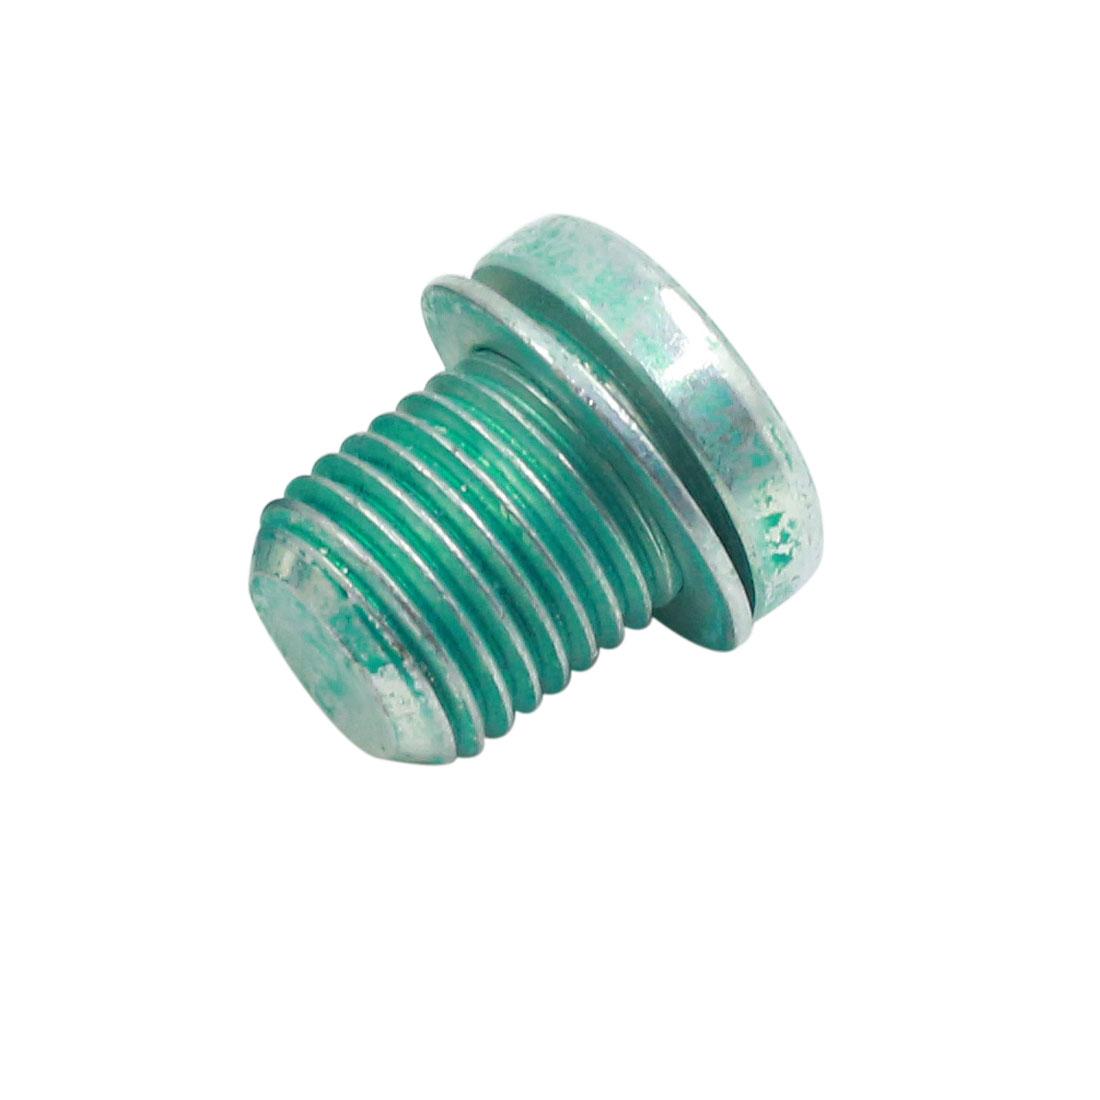 19 x 20mm Green Magnetic Engine Oil Pan Drain Plug Bolt for Automotive Car